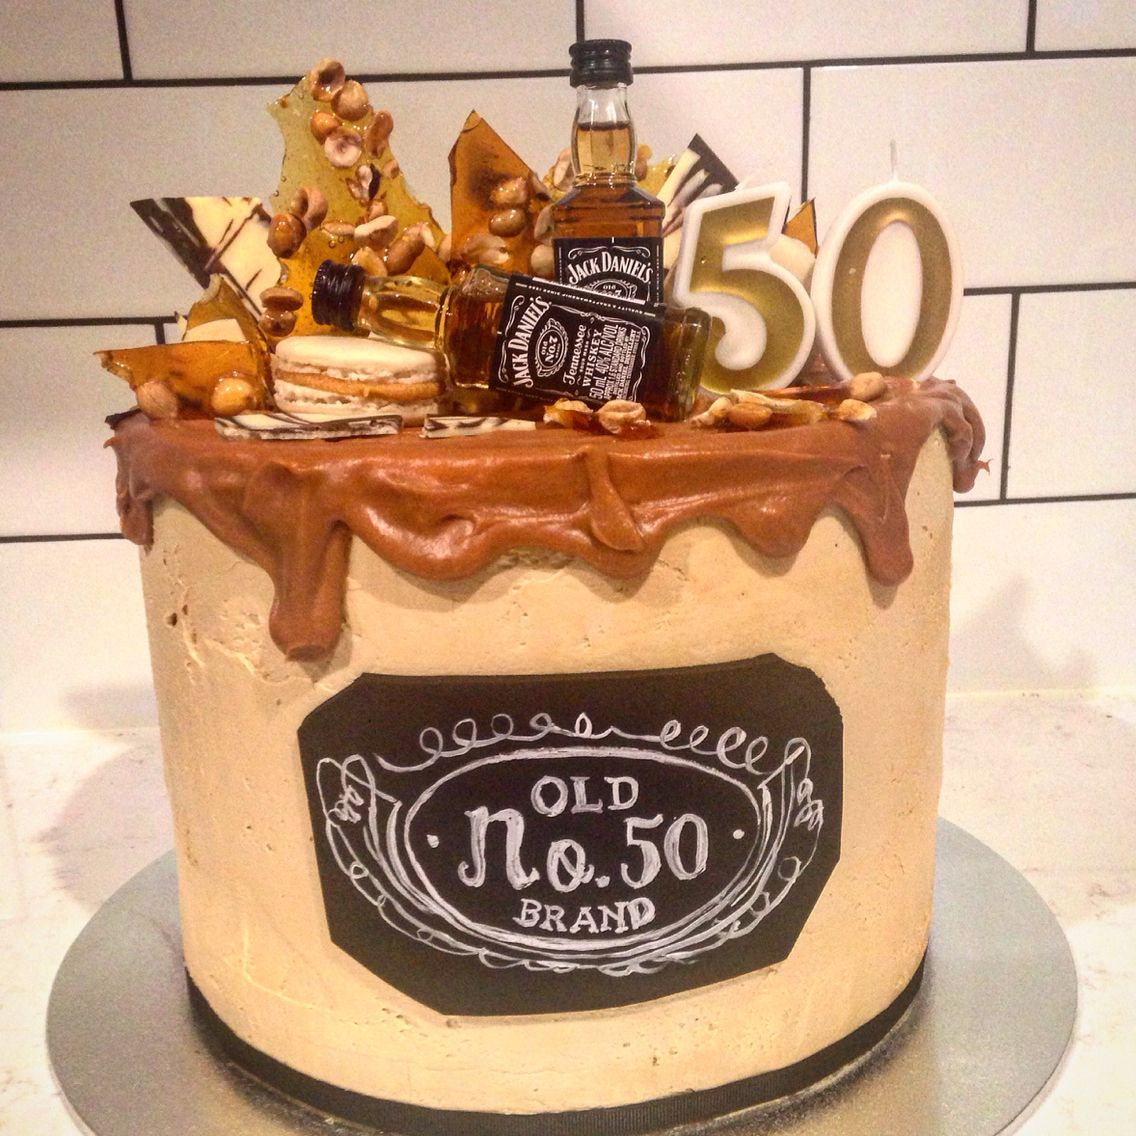 Jack Daniels 50th Birthday Cake Layers Of Chocolate Cake Victoria